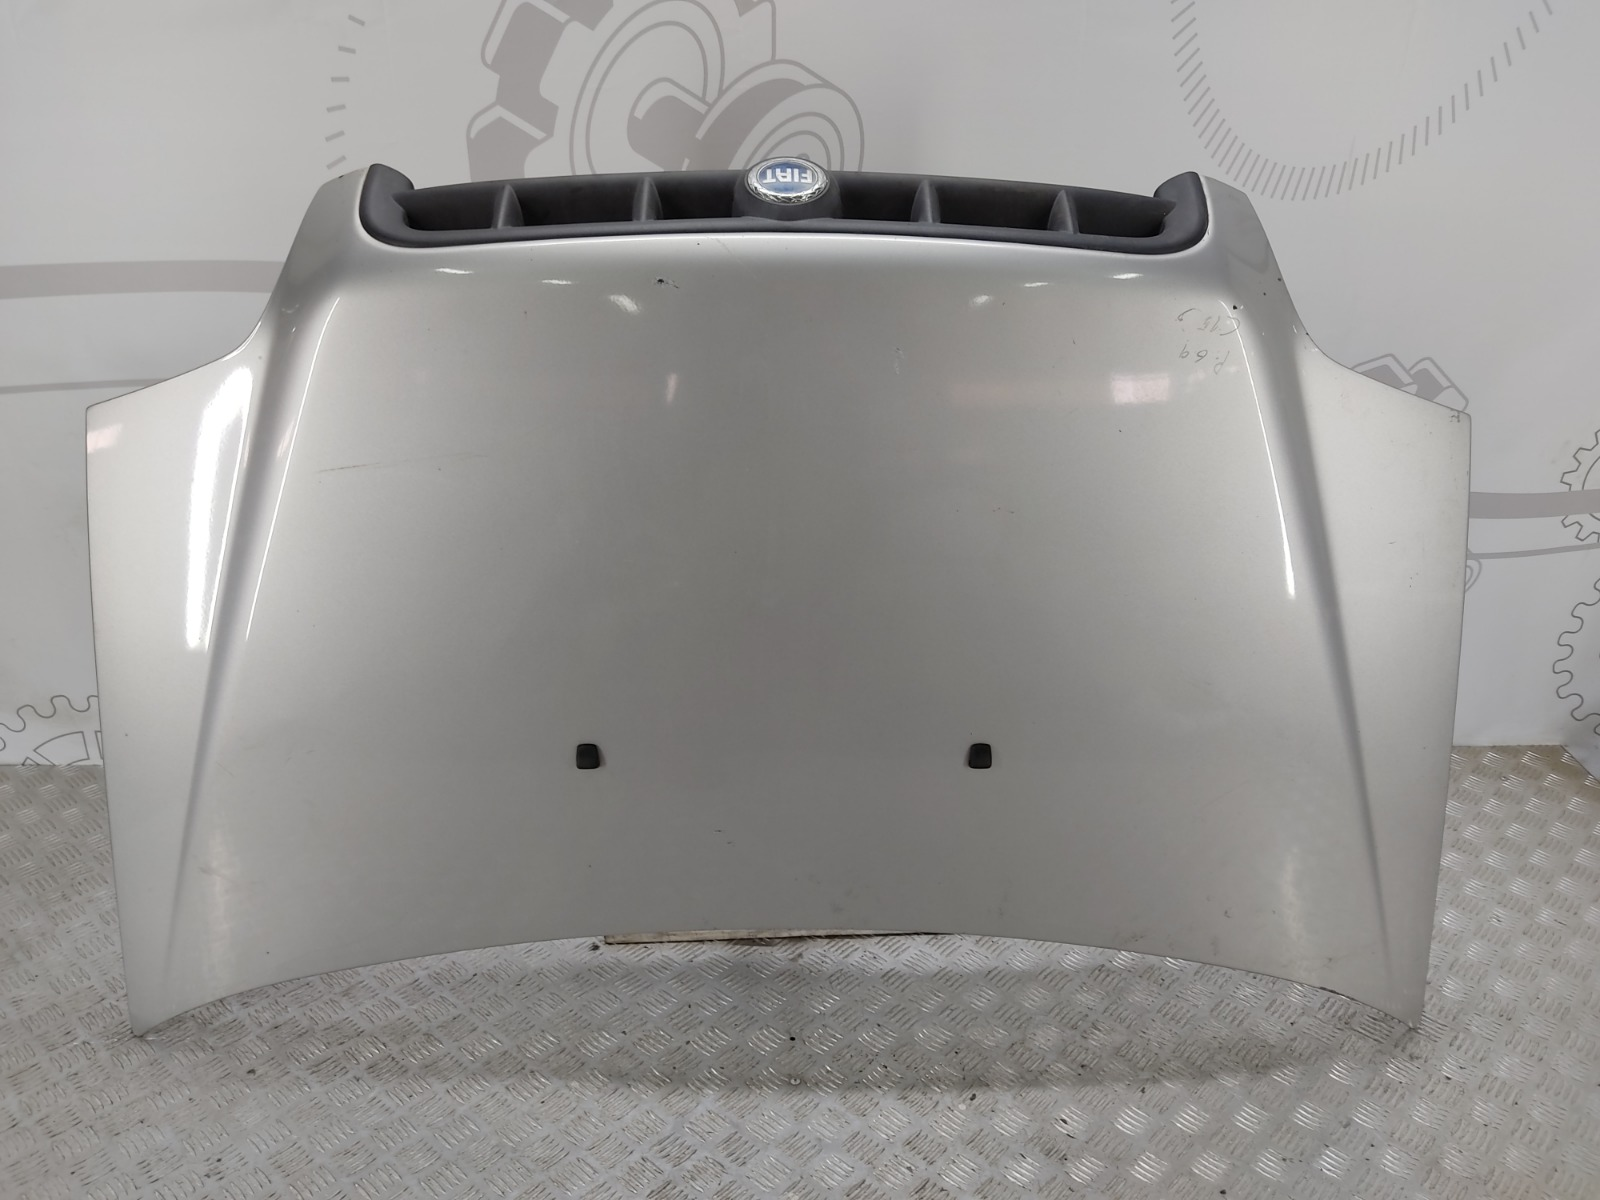 Капот Fiat Doblo 1.9 JTD 2002 (б/у)